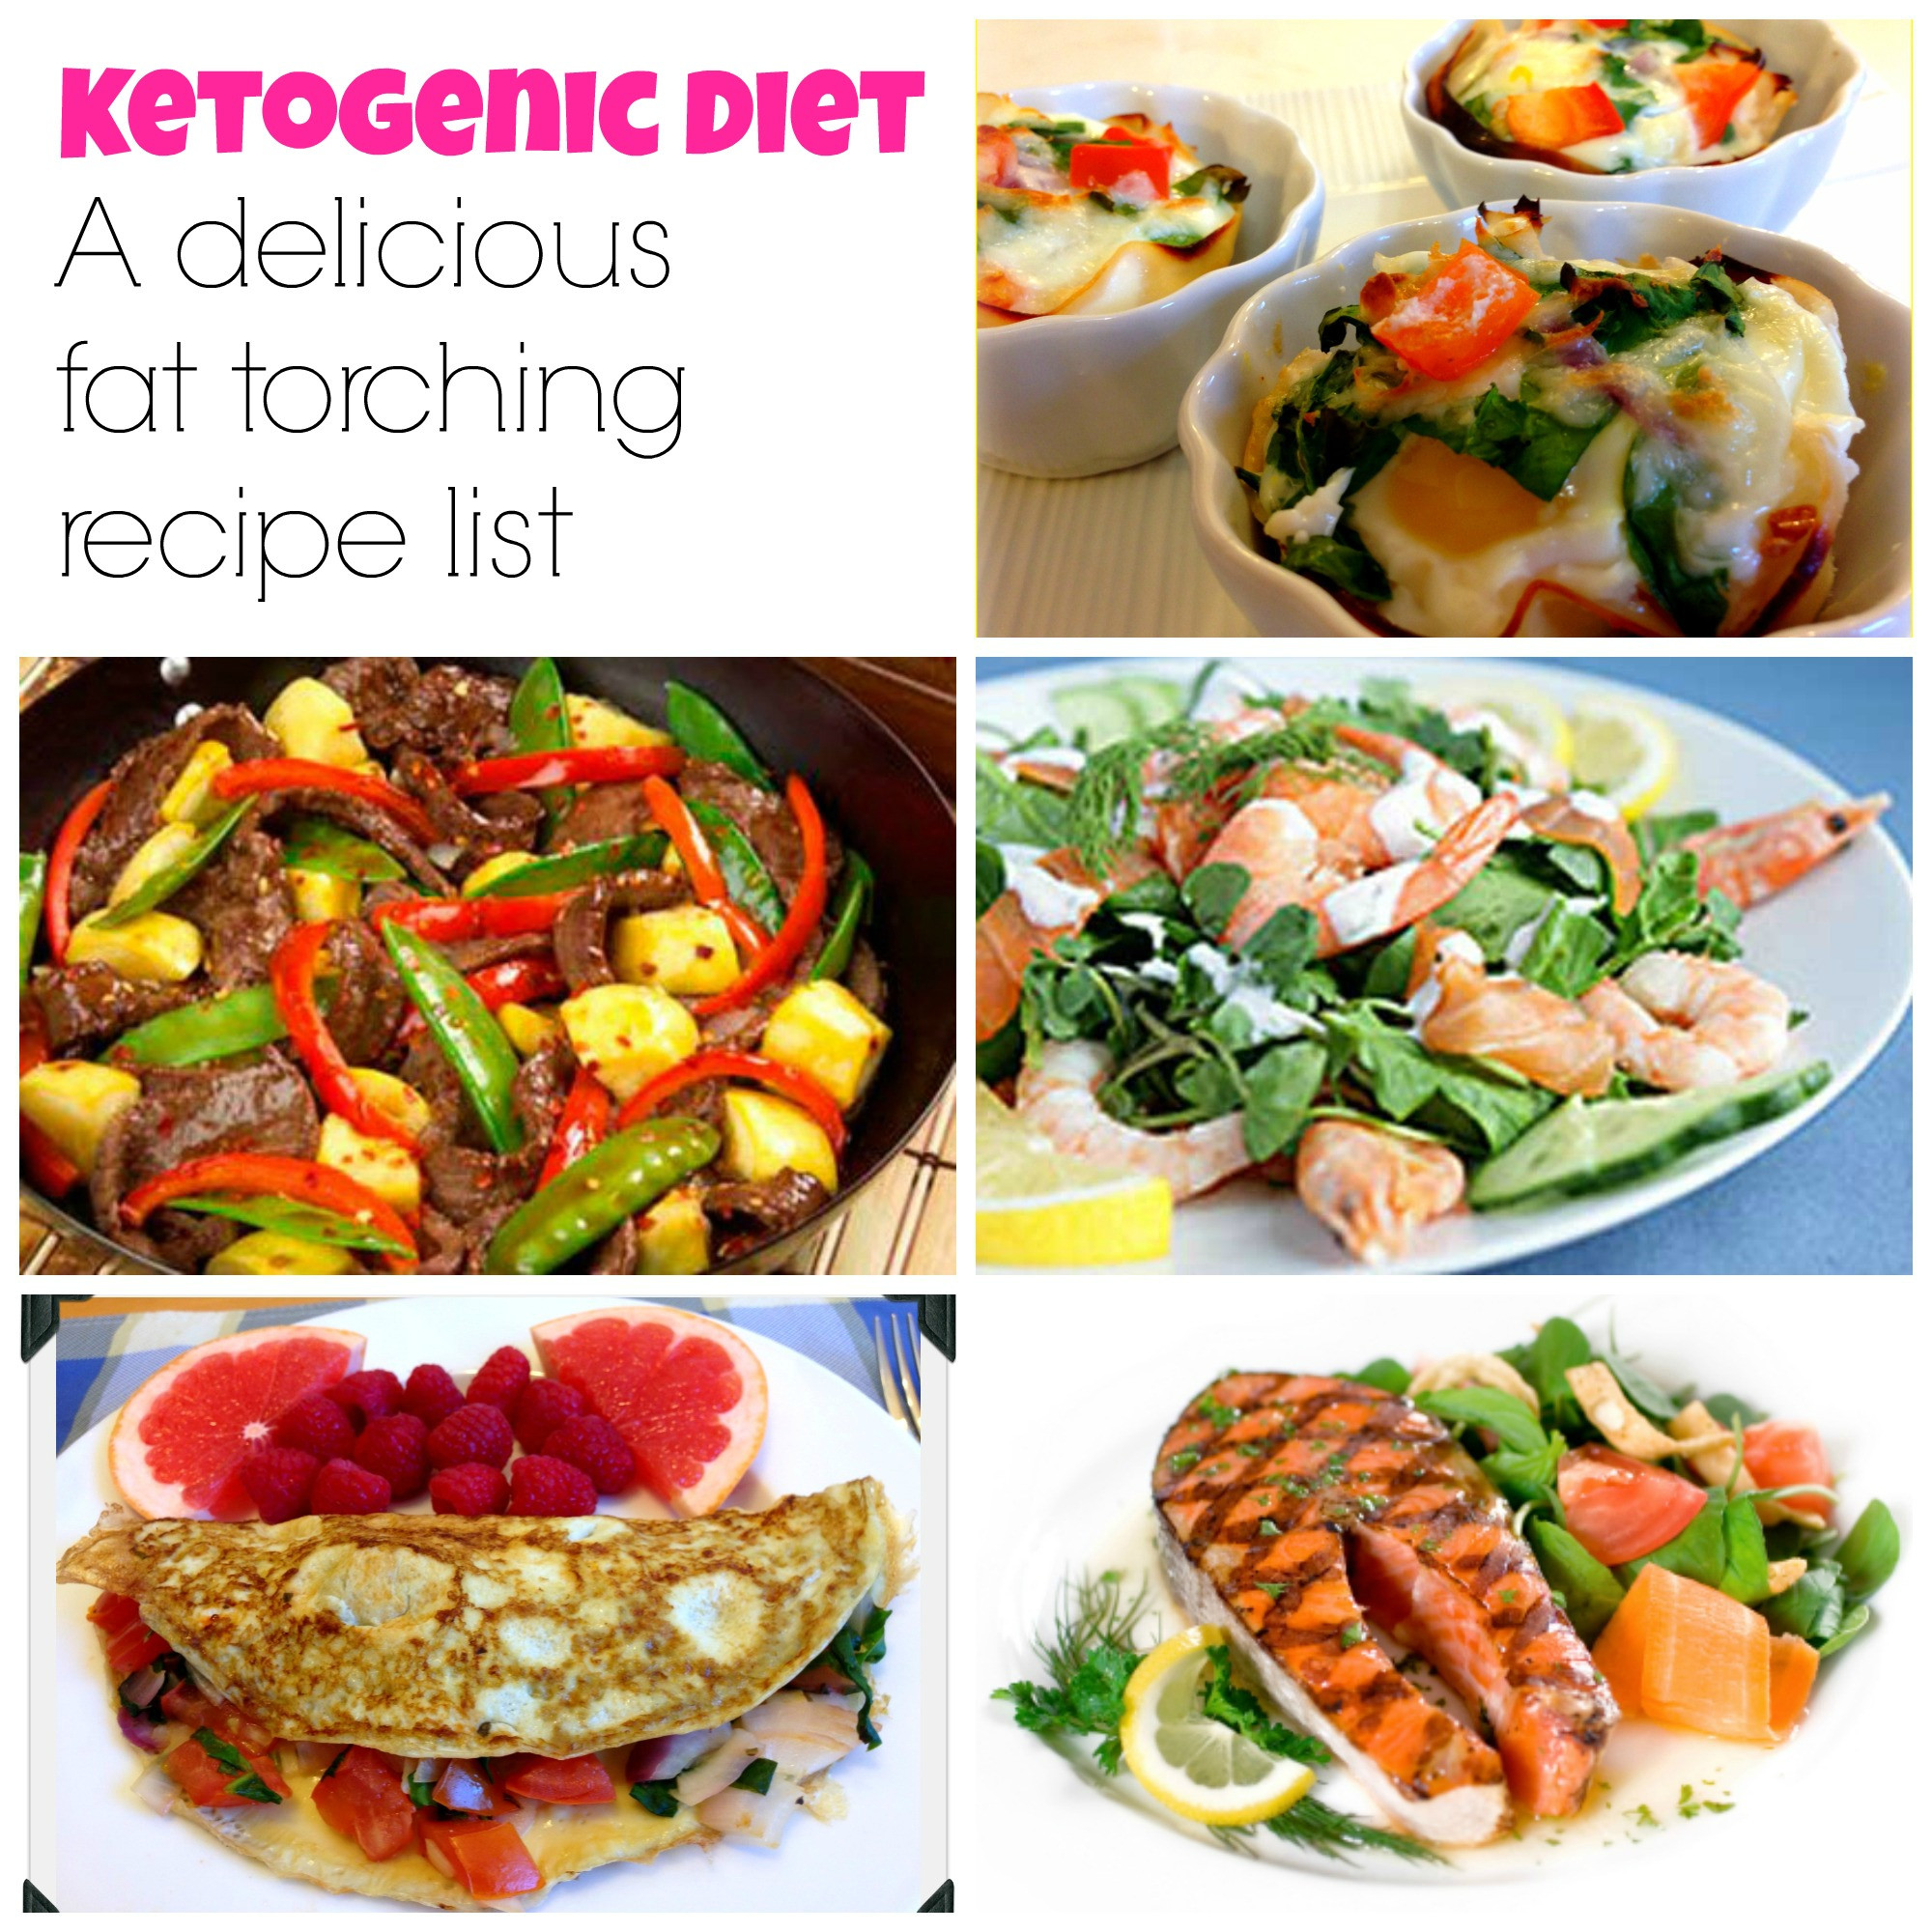 Free Keto Diet Recipes  The Best Ketogenic Diet Recipes My Dream Shape